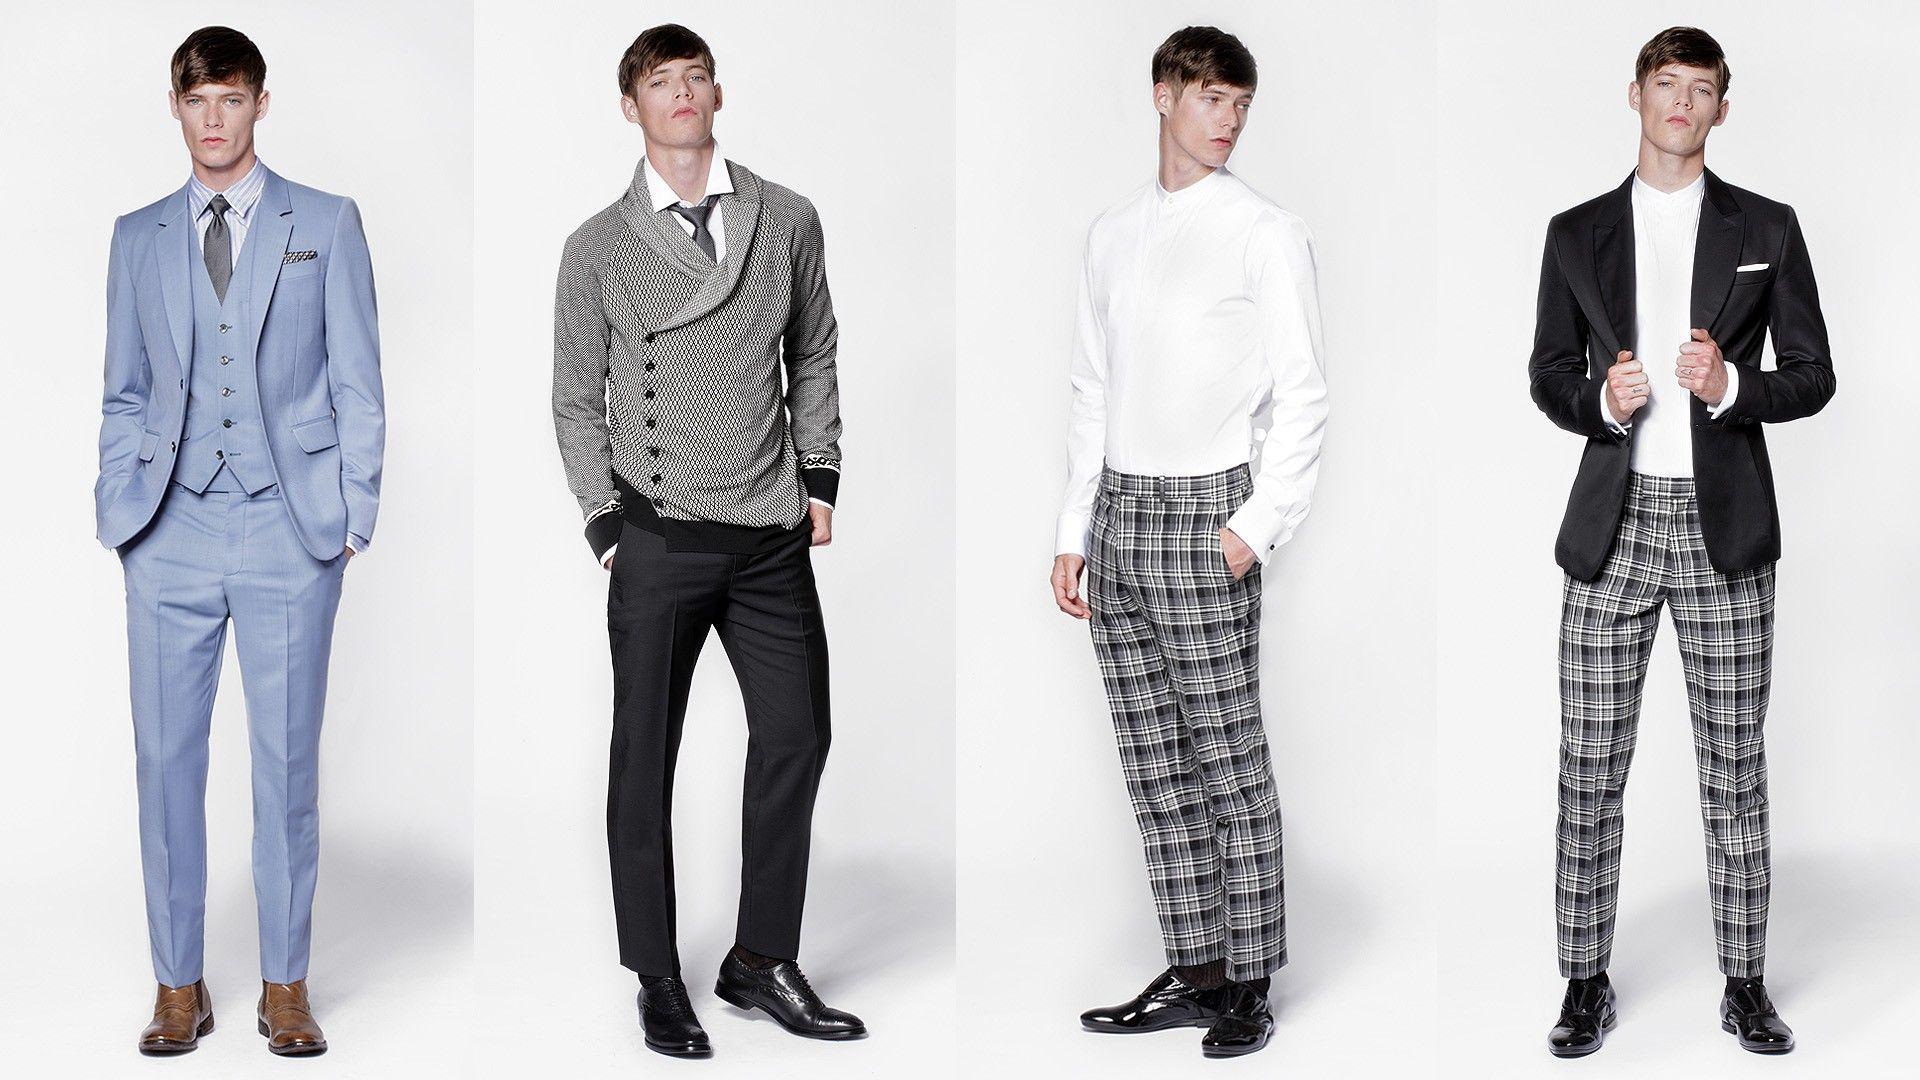 Fashion Men Casual Shirts Wallpaper Background HD Free Download | Mens  fashion casual, Fashion wallpaper, Fashion